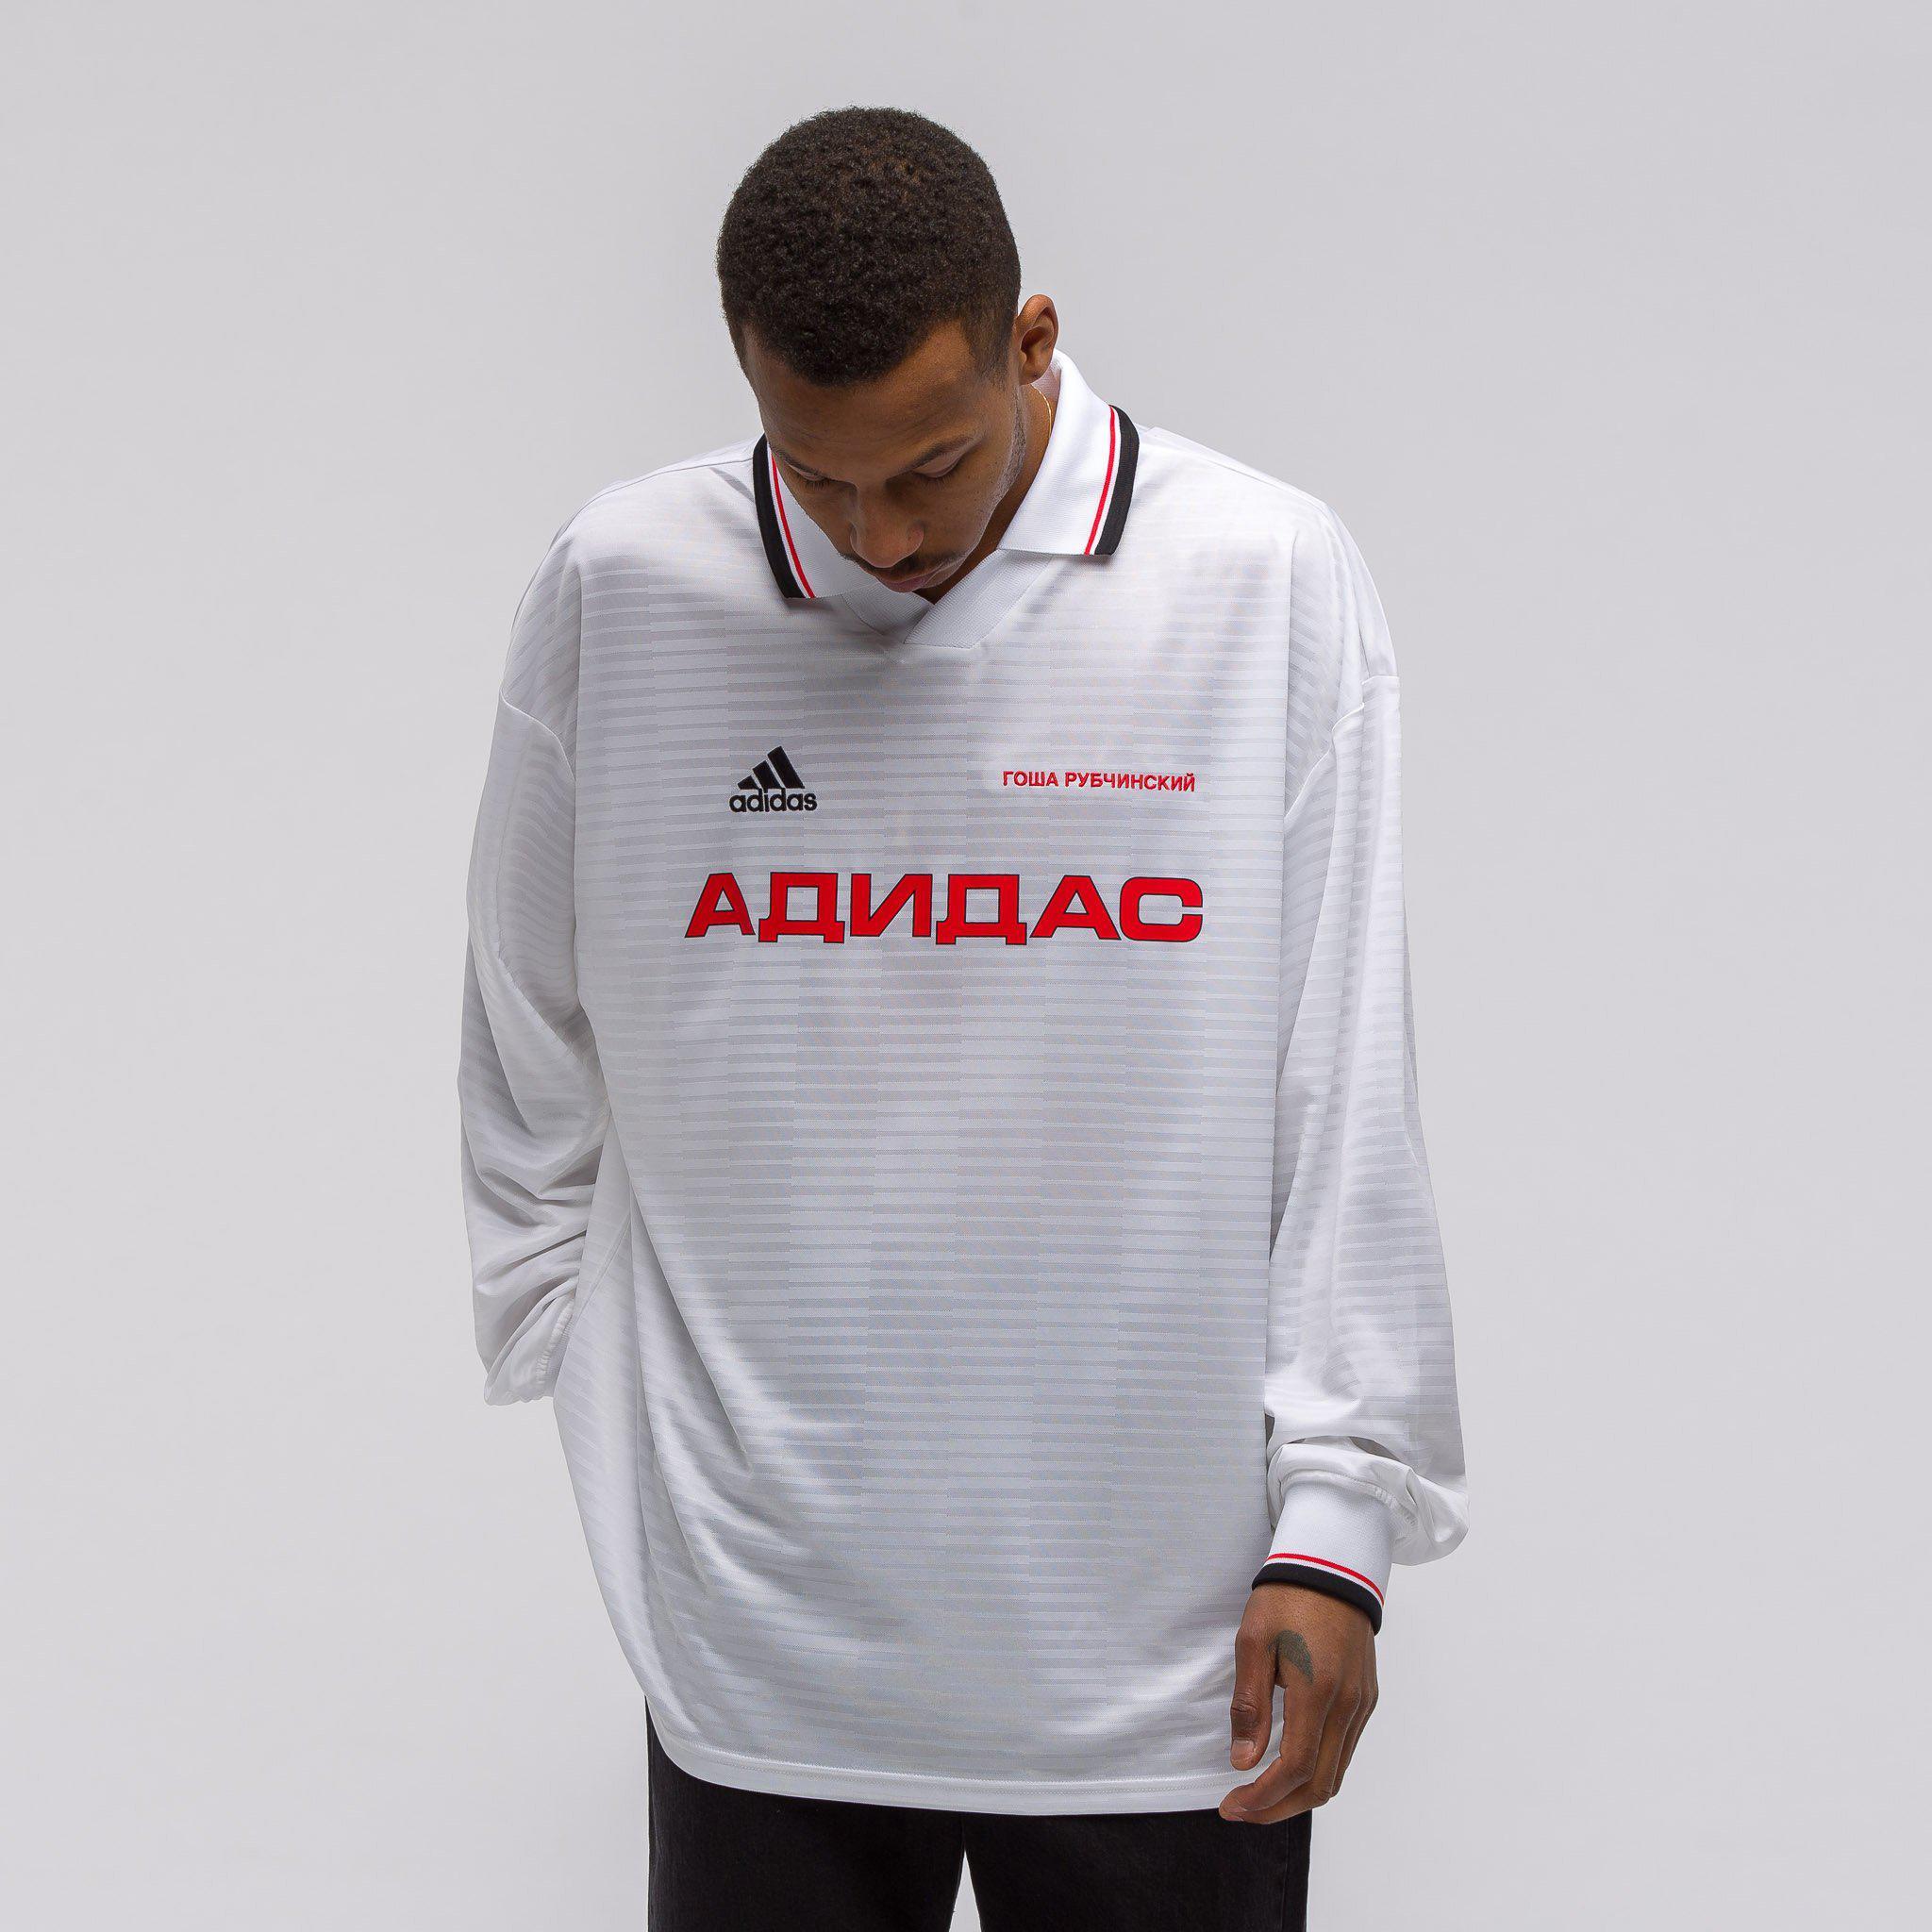 Gosha Rubchinskiy Synthetic X Adidas Long Sleeve Jersey Top In ...